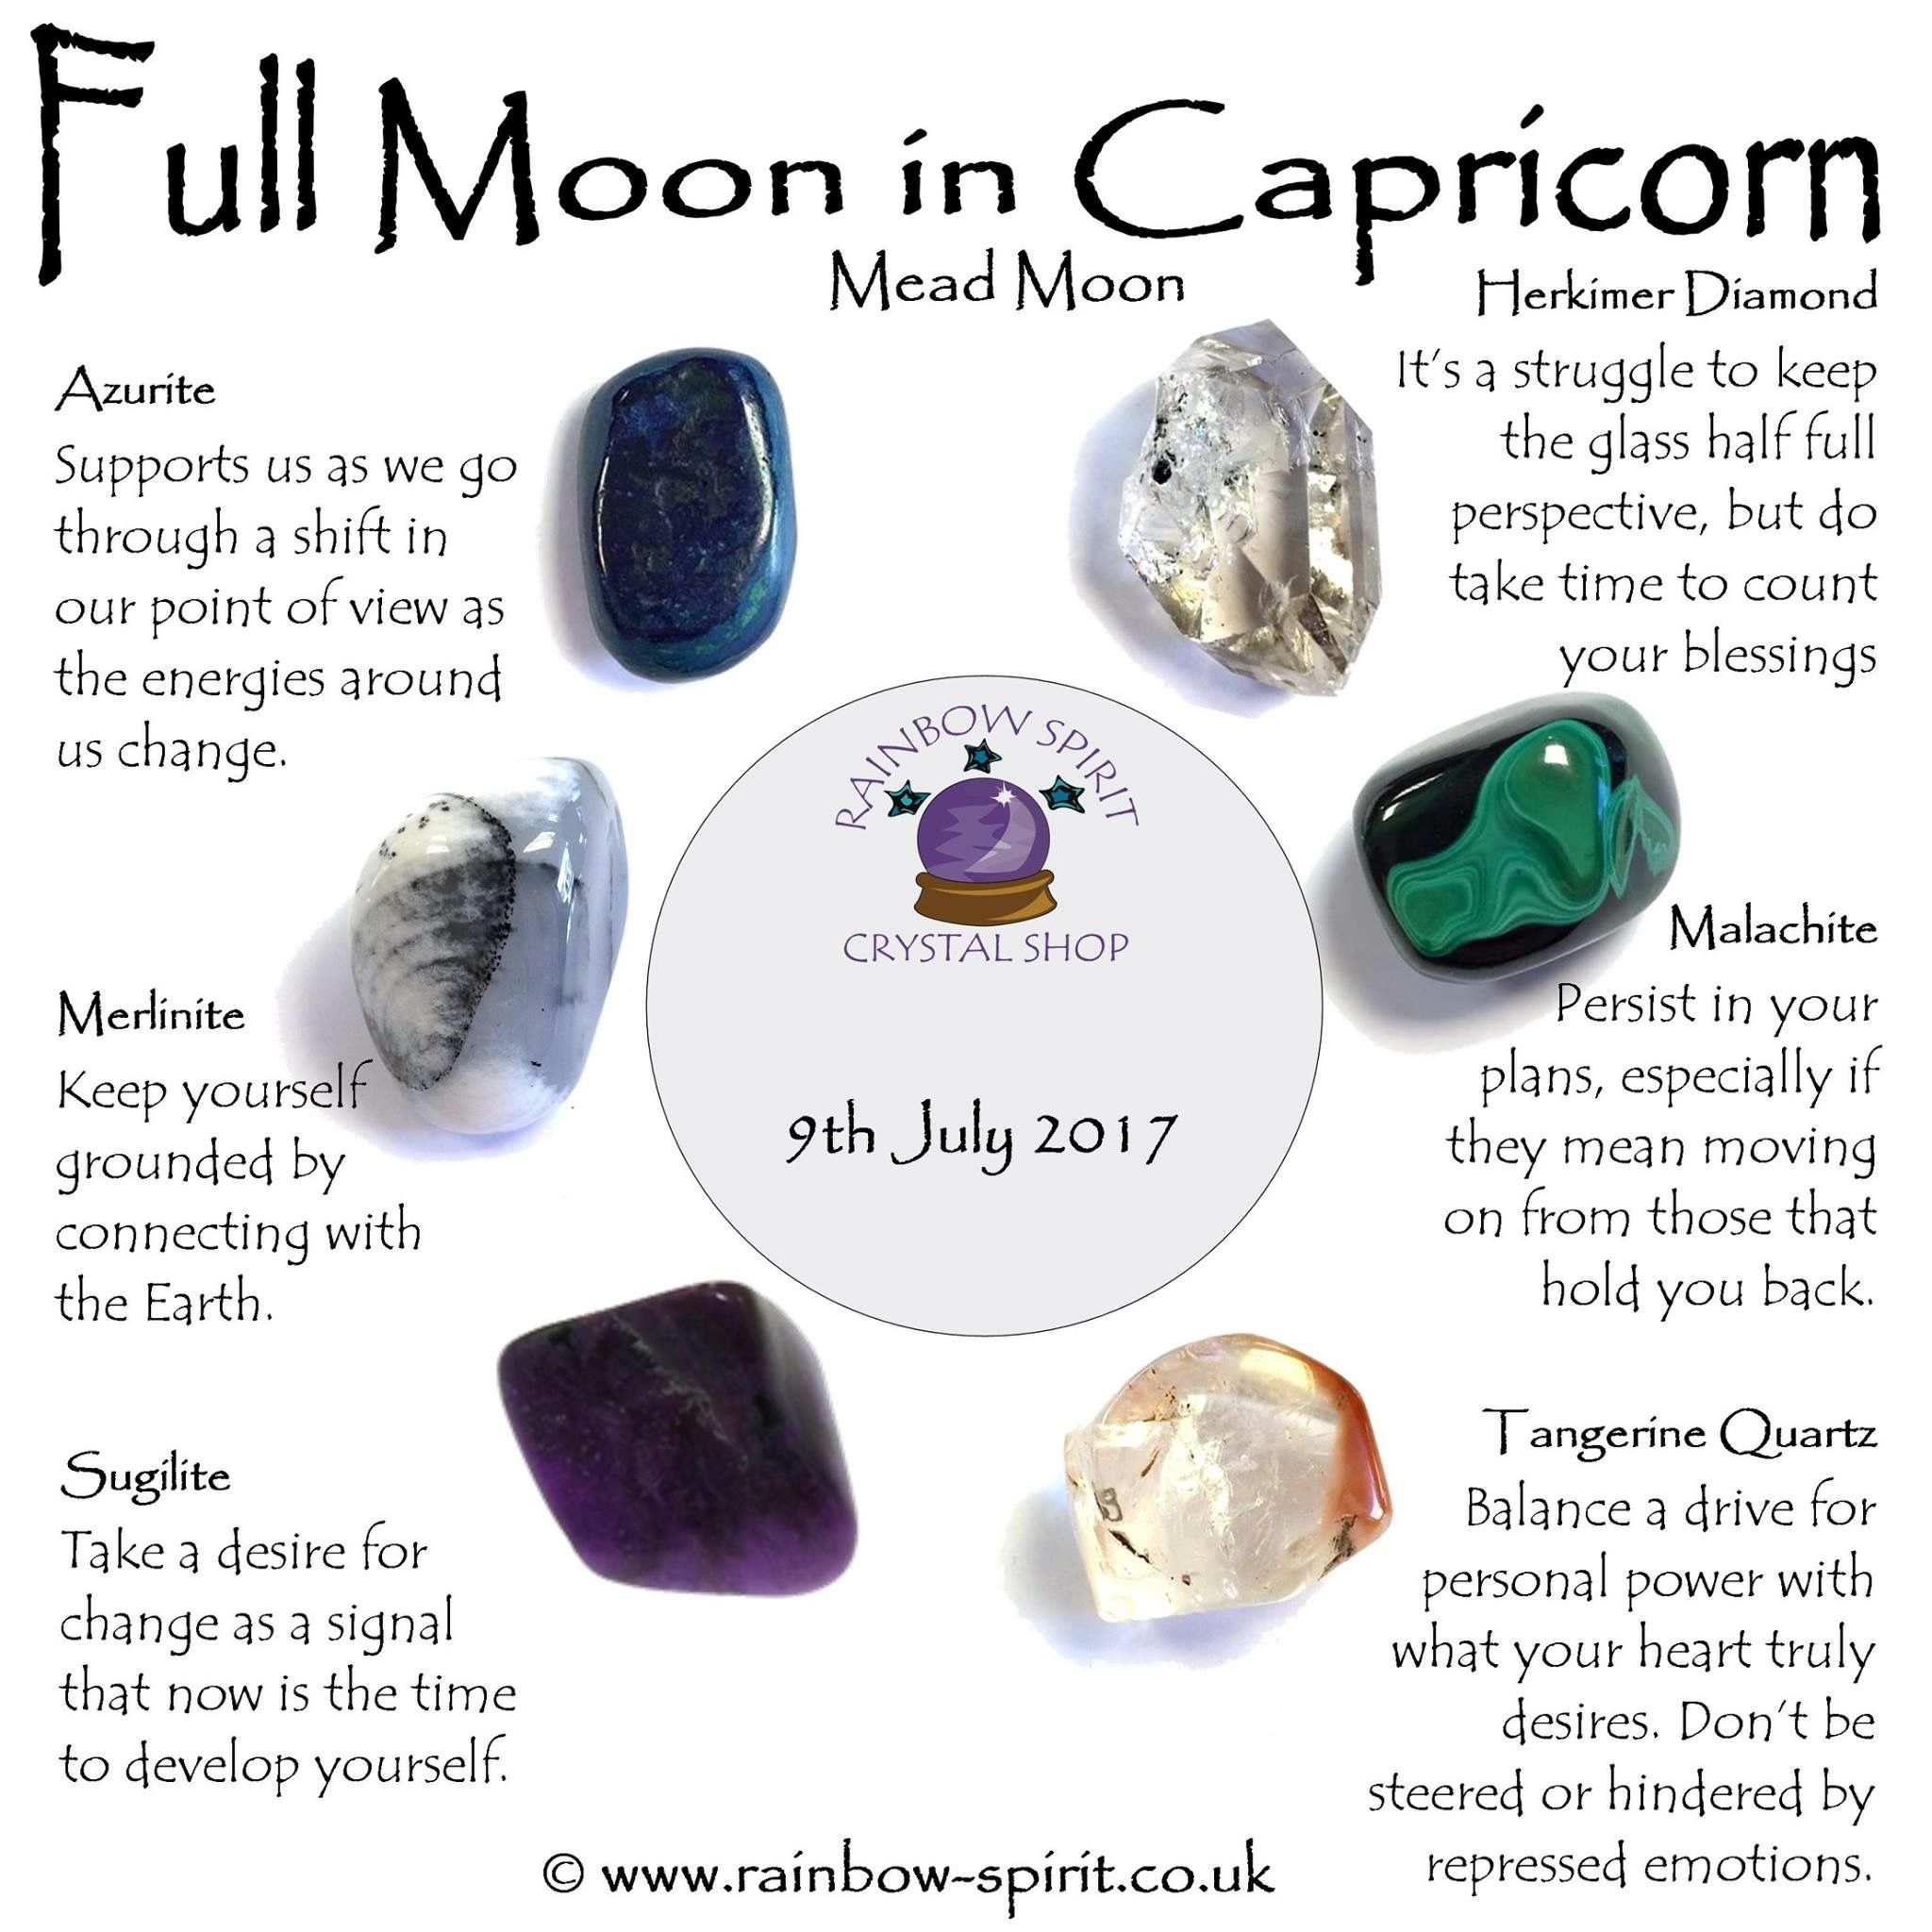 Full Moon Capricorn Crystals | Capricorn moon, Stones and ...